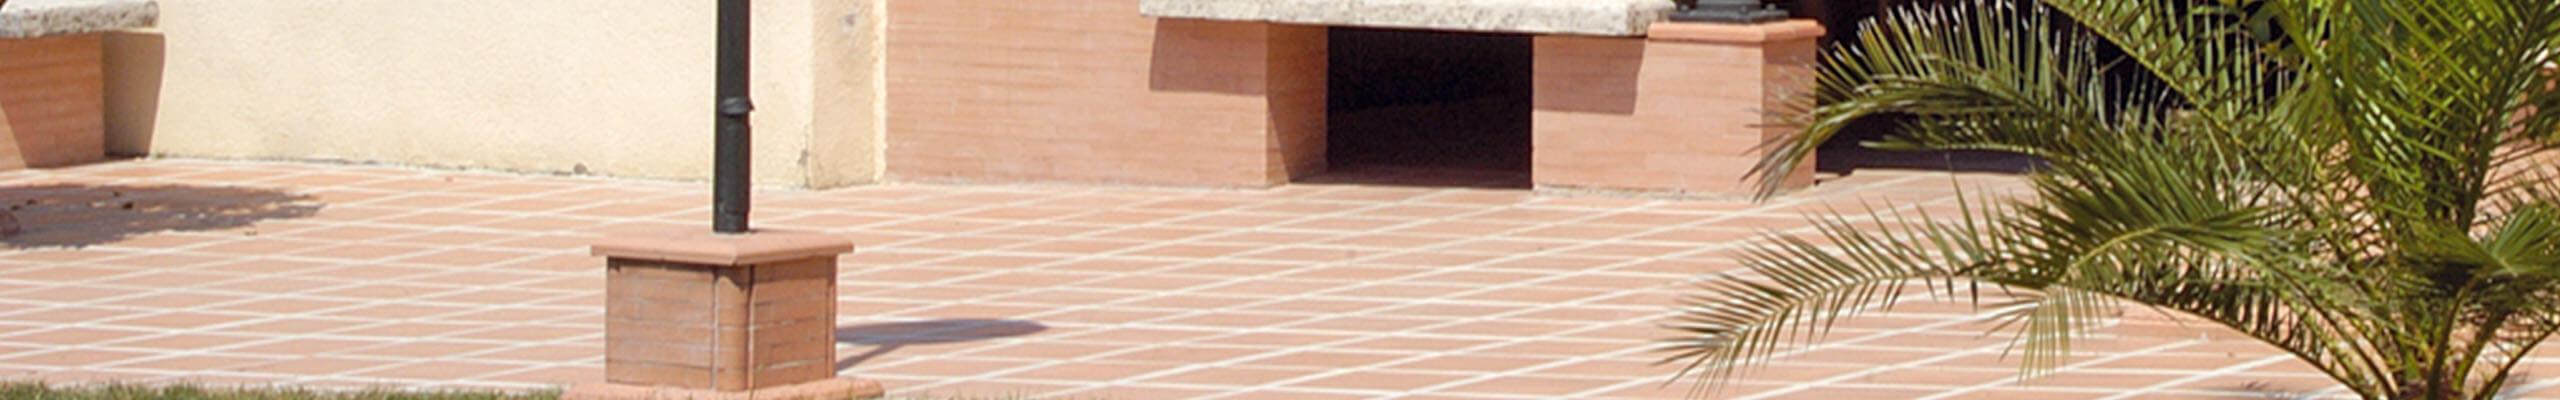 terracota-prensada-slamon-natural